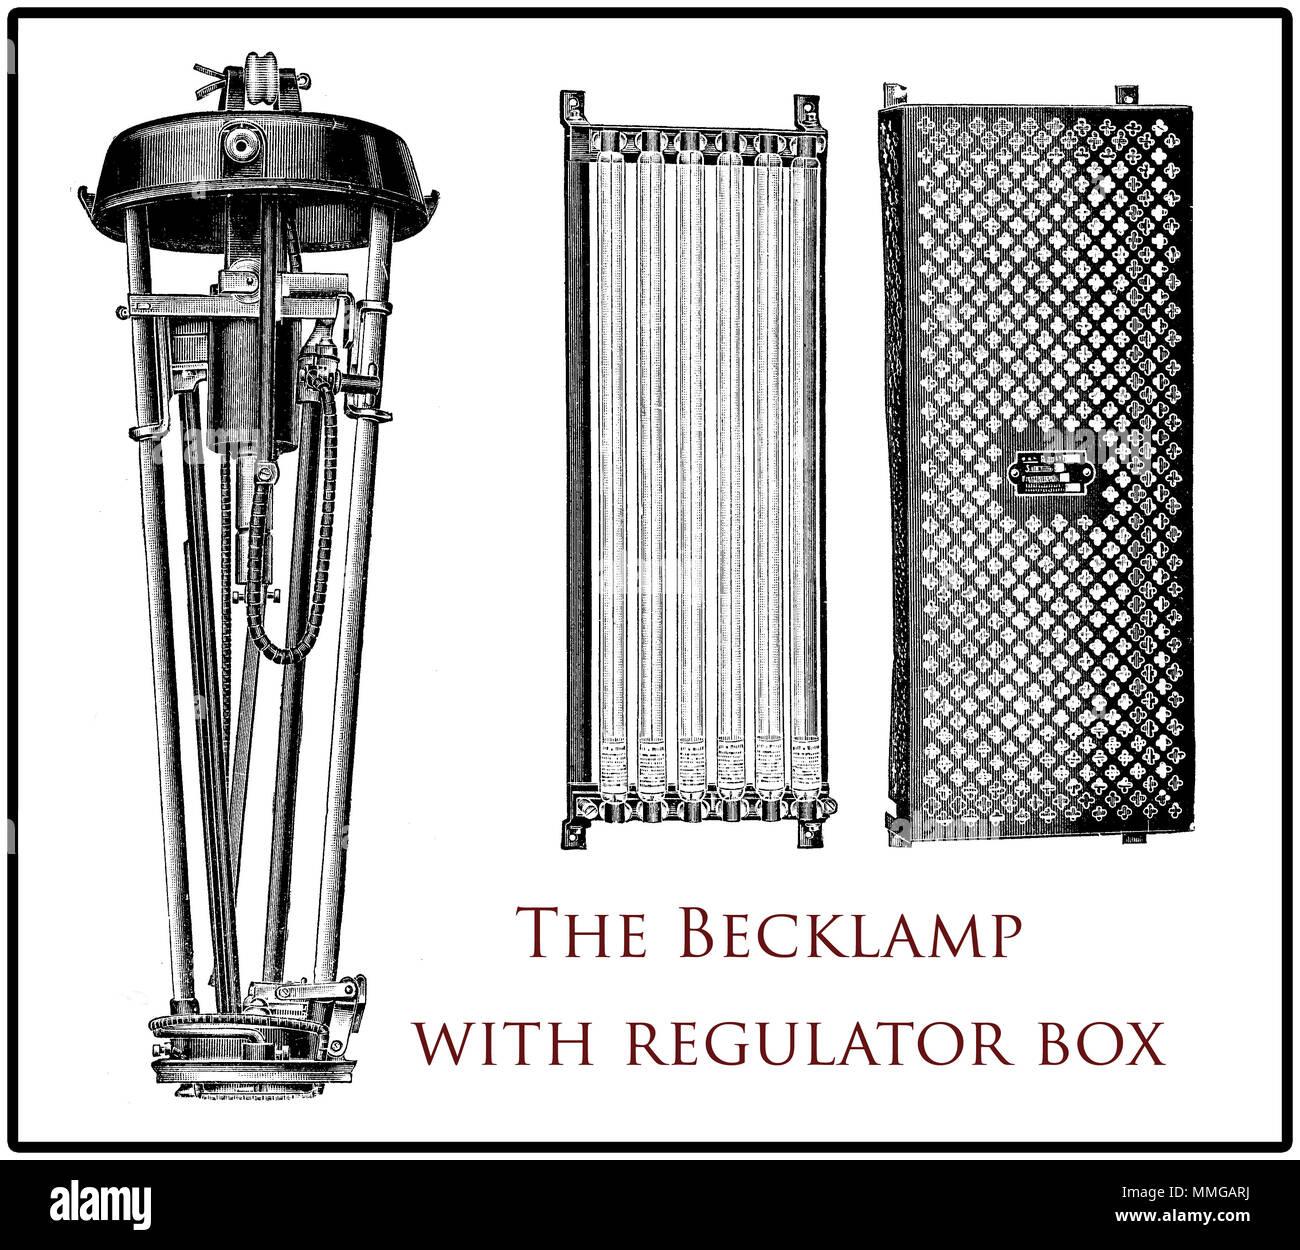 Vintage Becklamp, arc lamp with its regulator box, XIX century engraving - Stock Image